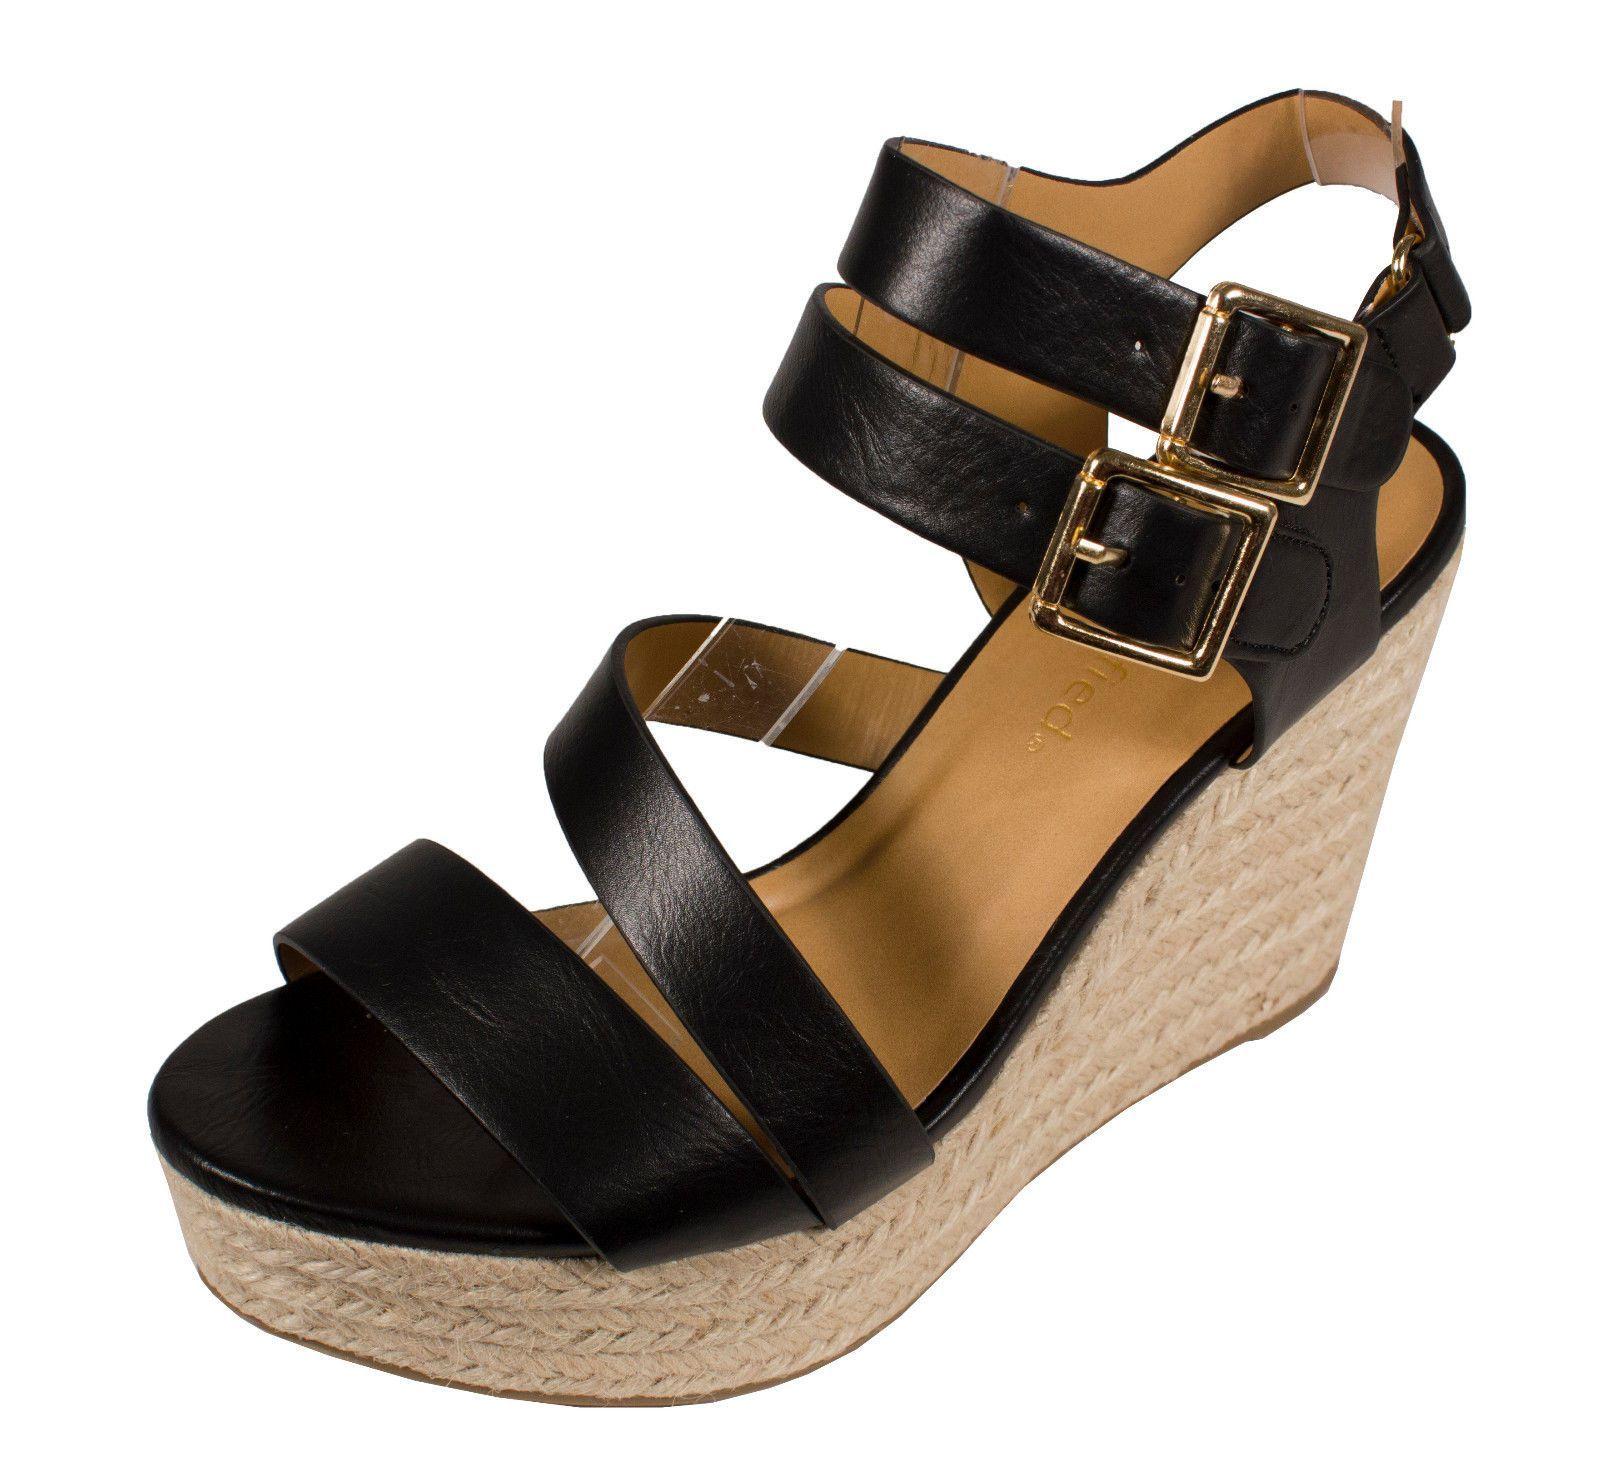 b3ebfea436b Justina City Classified Strappy Opentoe Platform Wedge Sandal Black  Leatherette